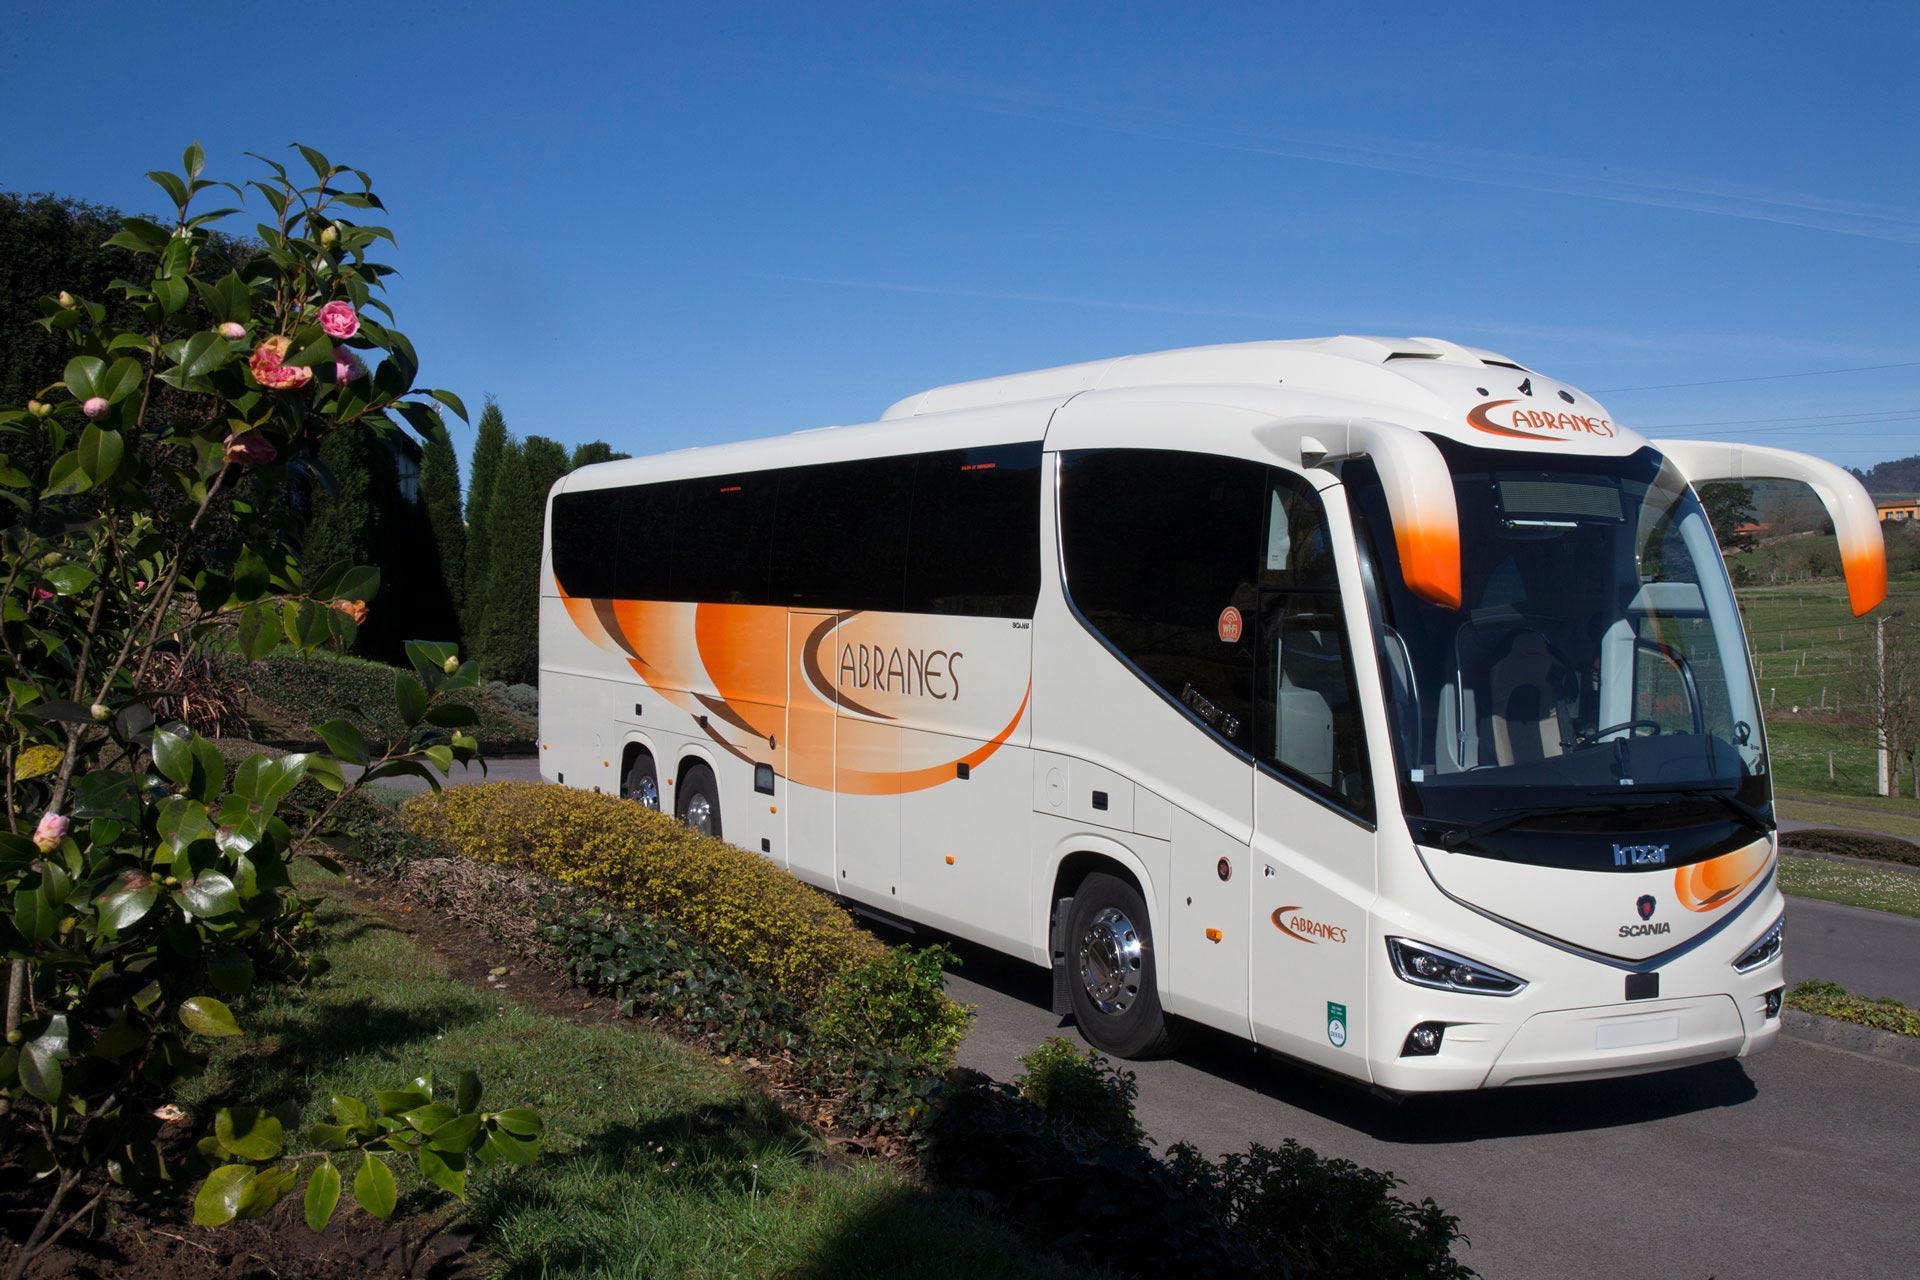 Alquiler de autocares de lujo en Asturias